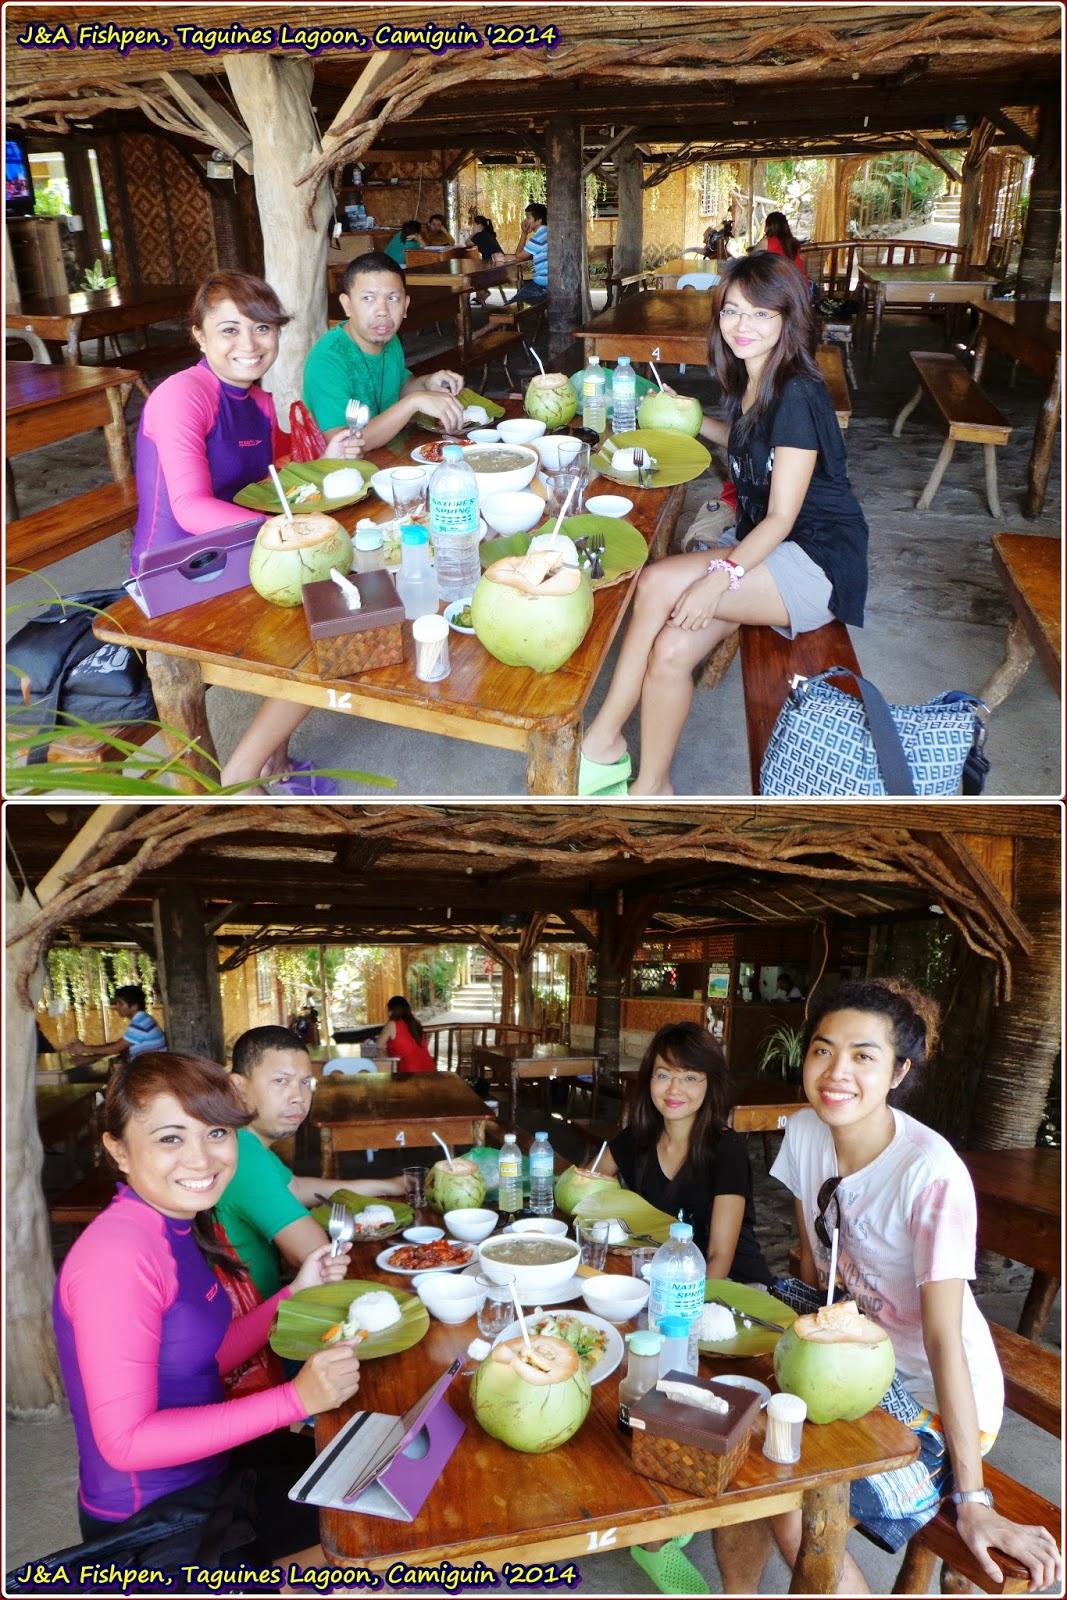 J&A Fishpen Resort, Taguines Lagoon, Camiguin